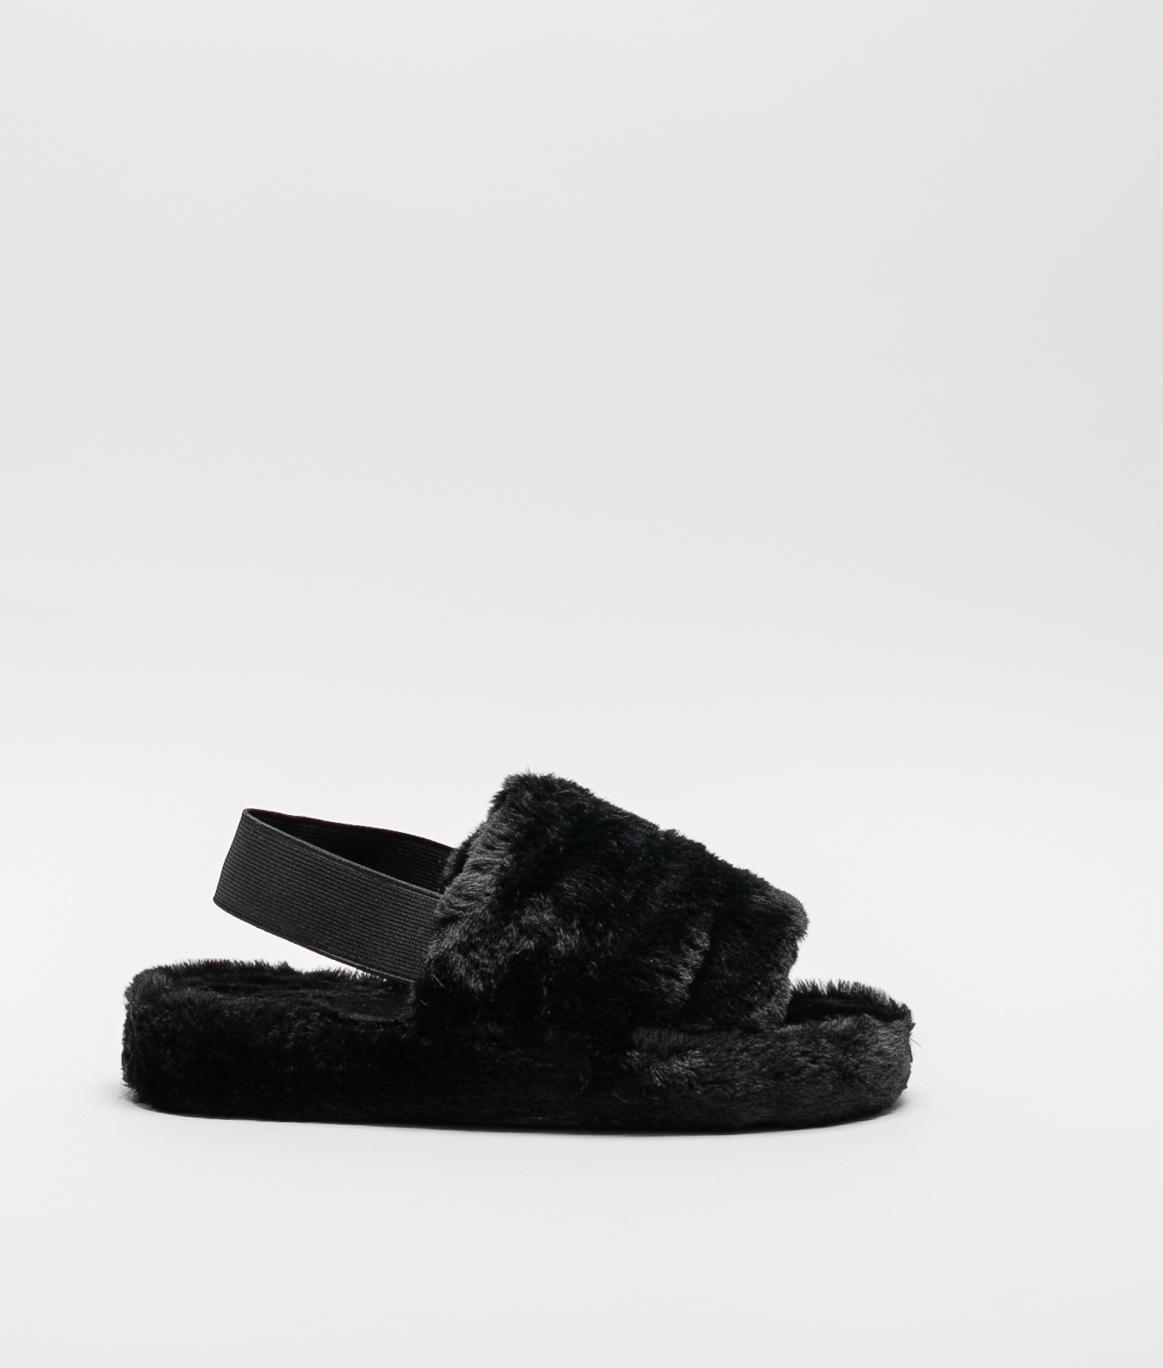 MINDI SLIPPERS - BLACK